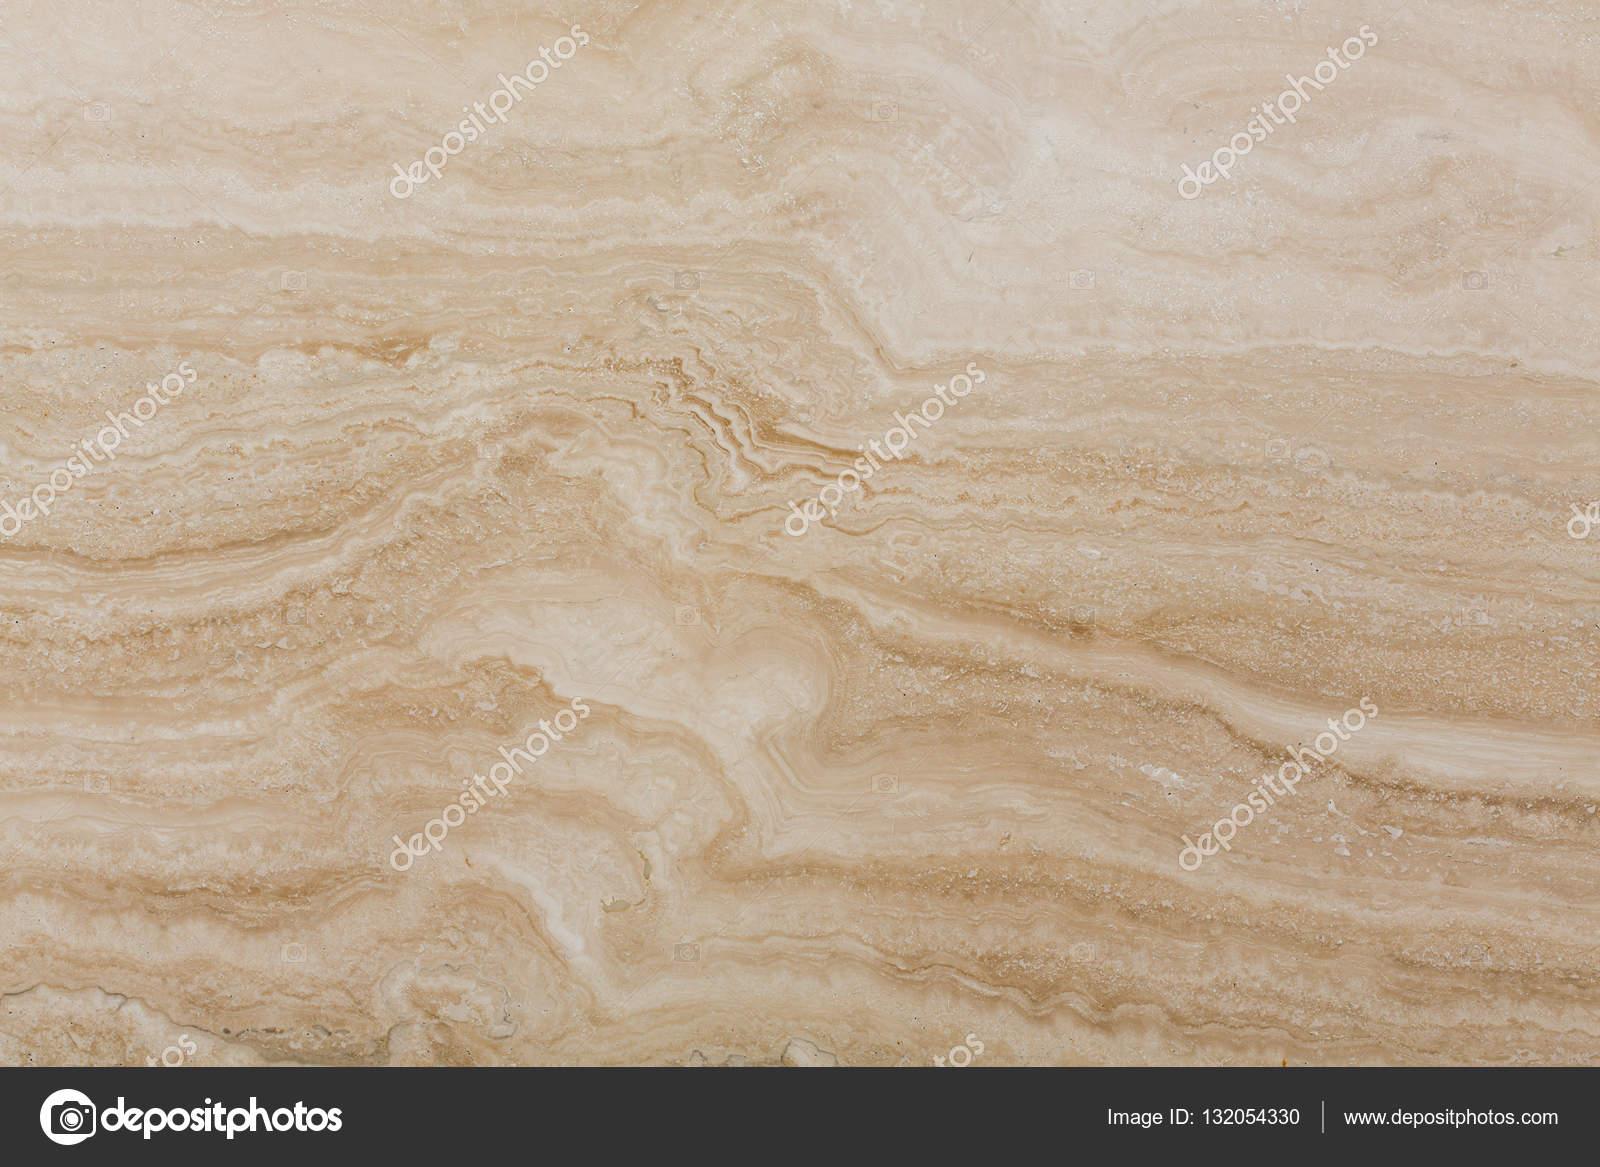 Beige Travertine Marble Texture Beige Travertine Marble Texture Stock Photo C Yamabikay 132054330